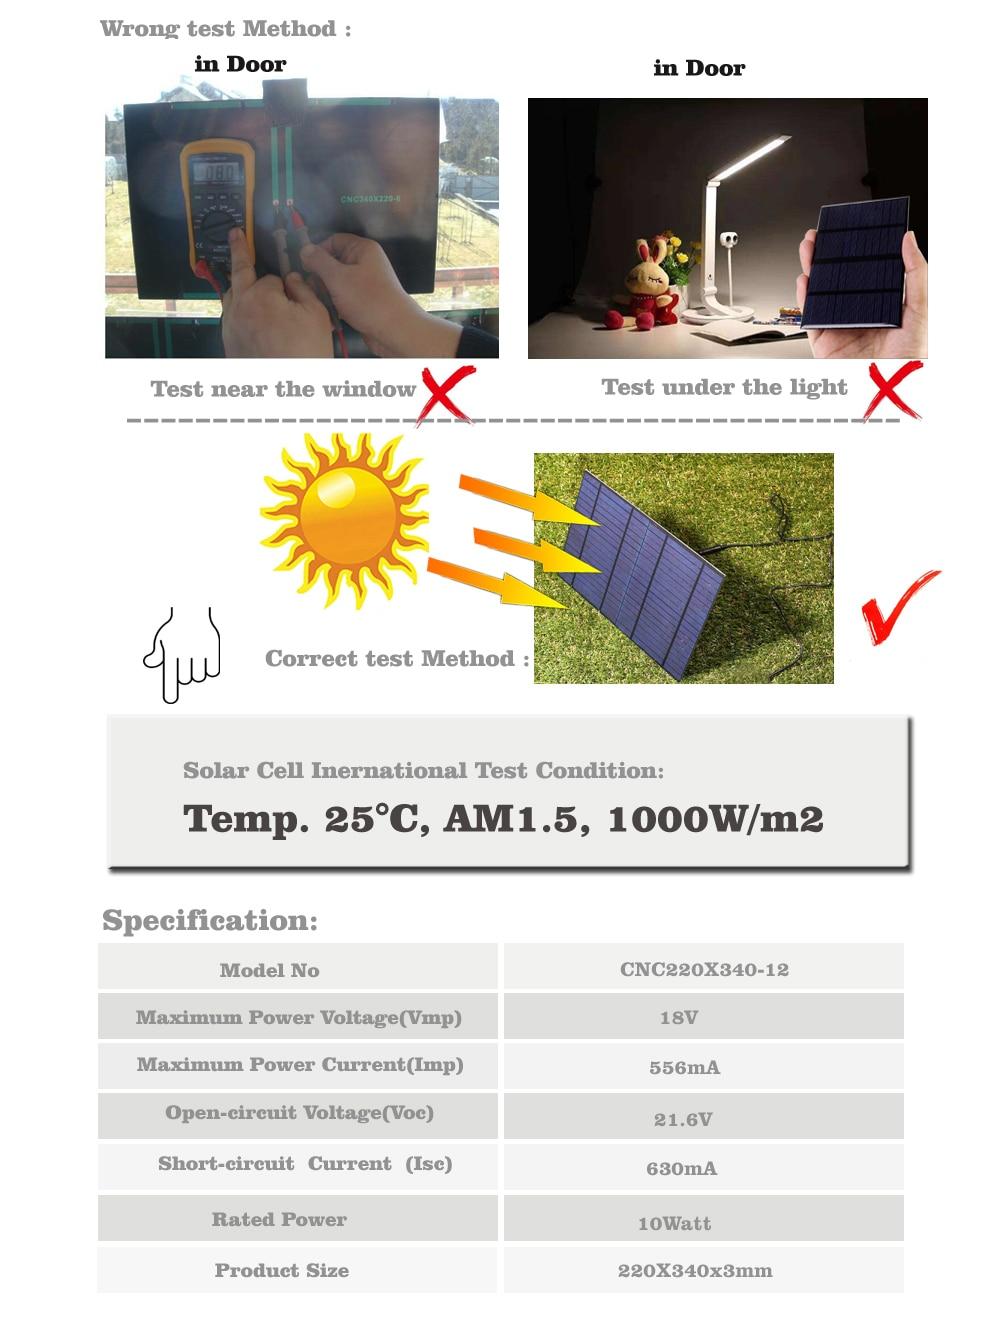 18 v 556ma 10 watts 10 w